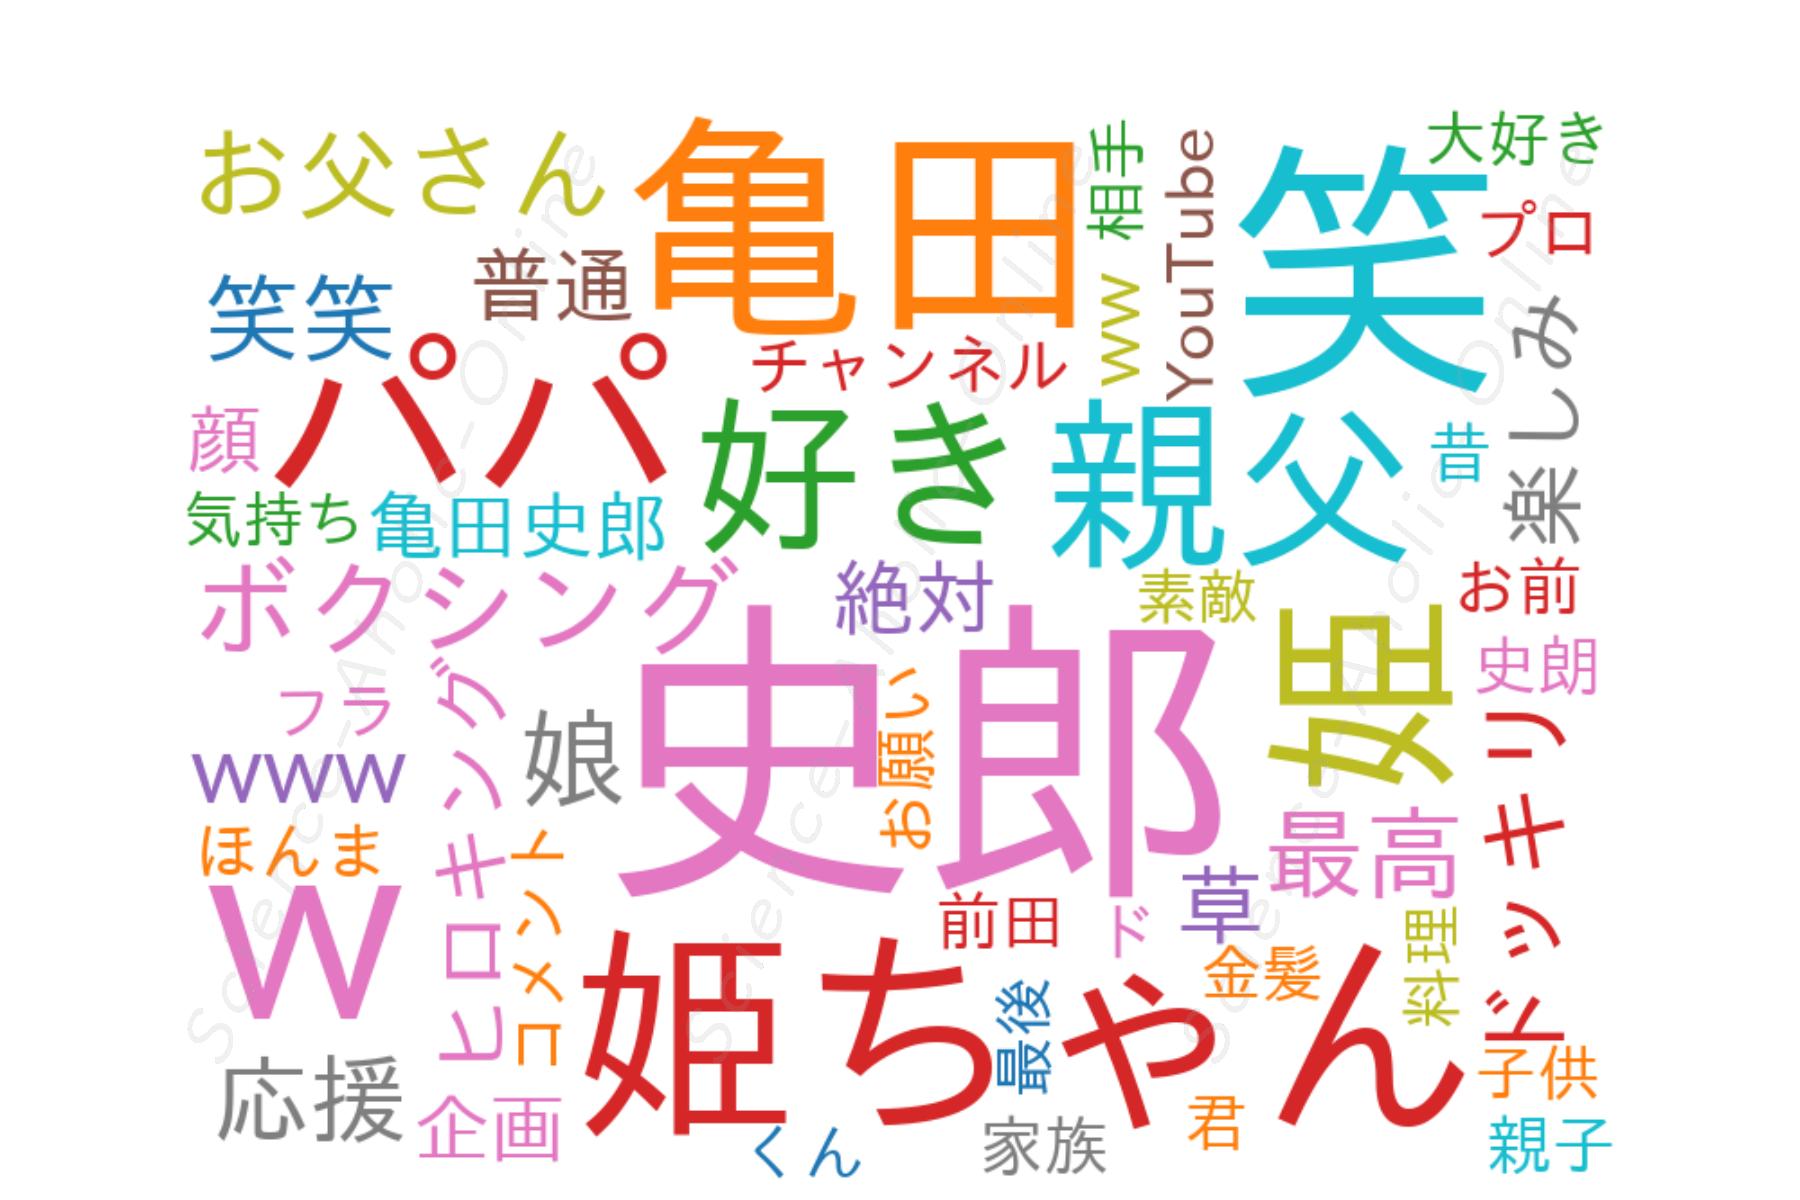 https://science-aholic-online.com/wp-content/uploads/2020/08/wordcloud_亀田史郎チャンネル.png